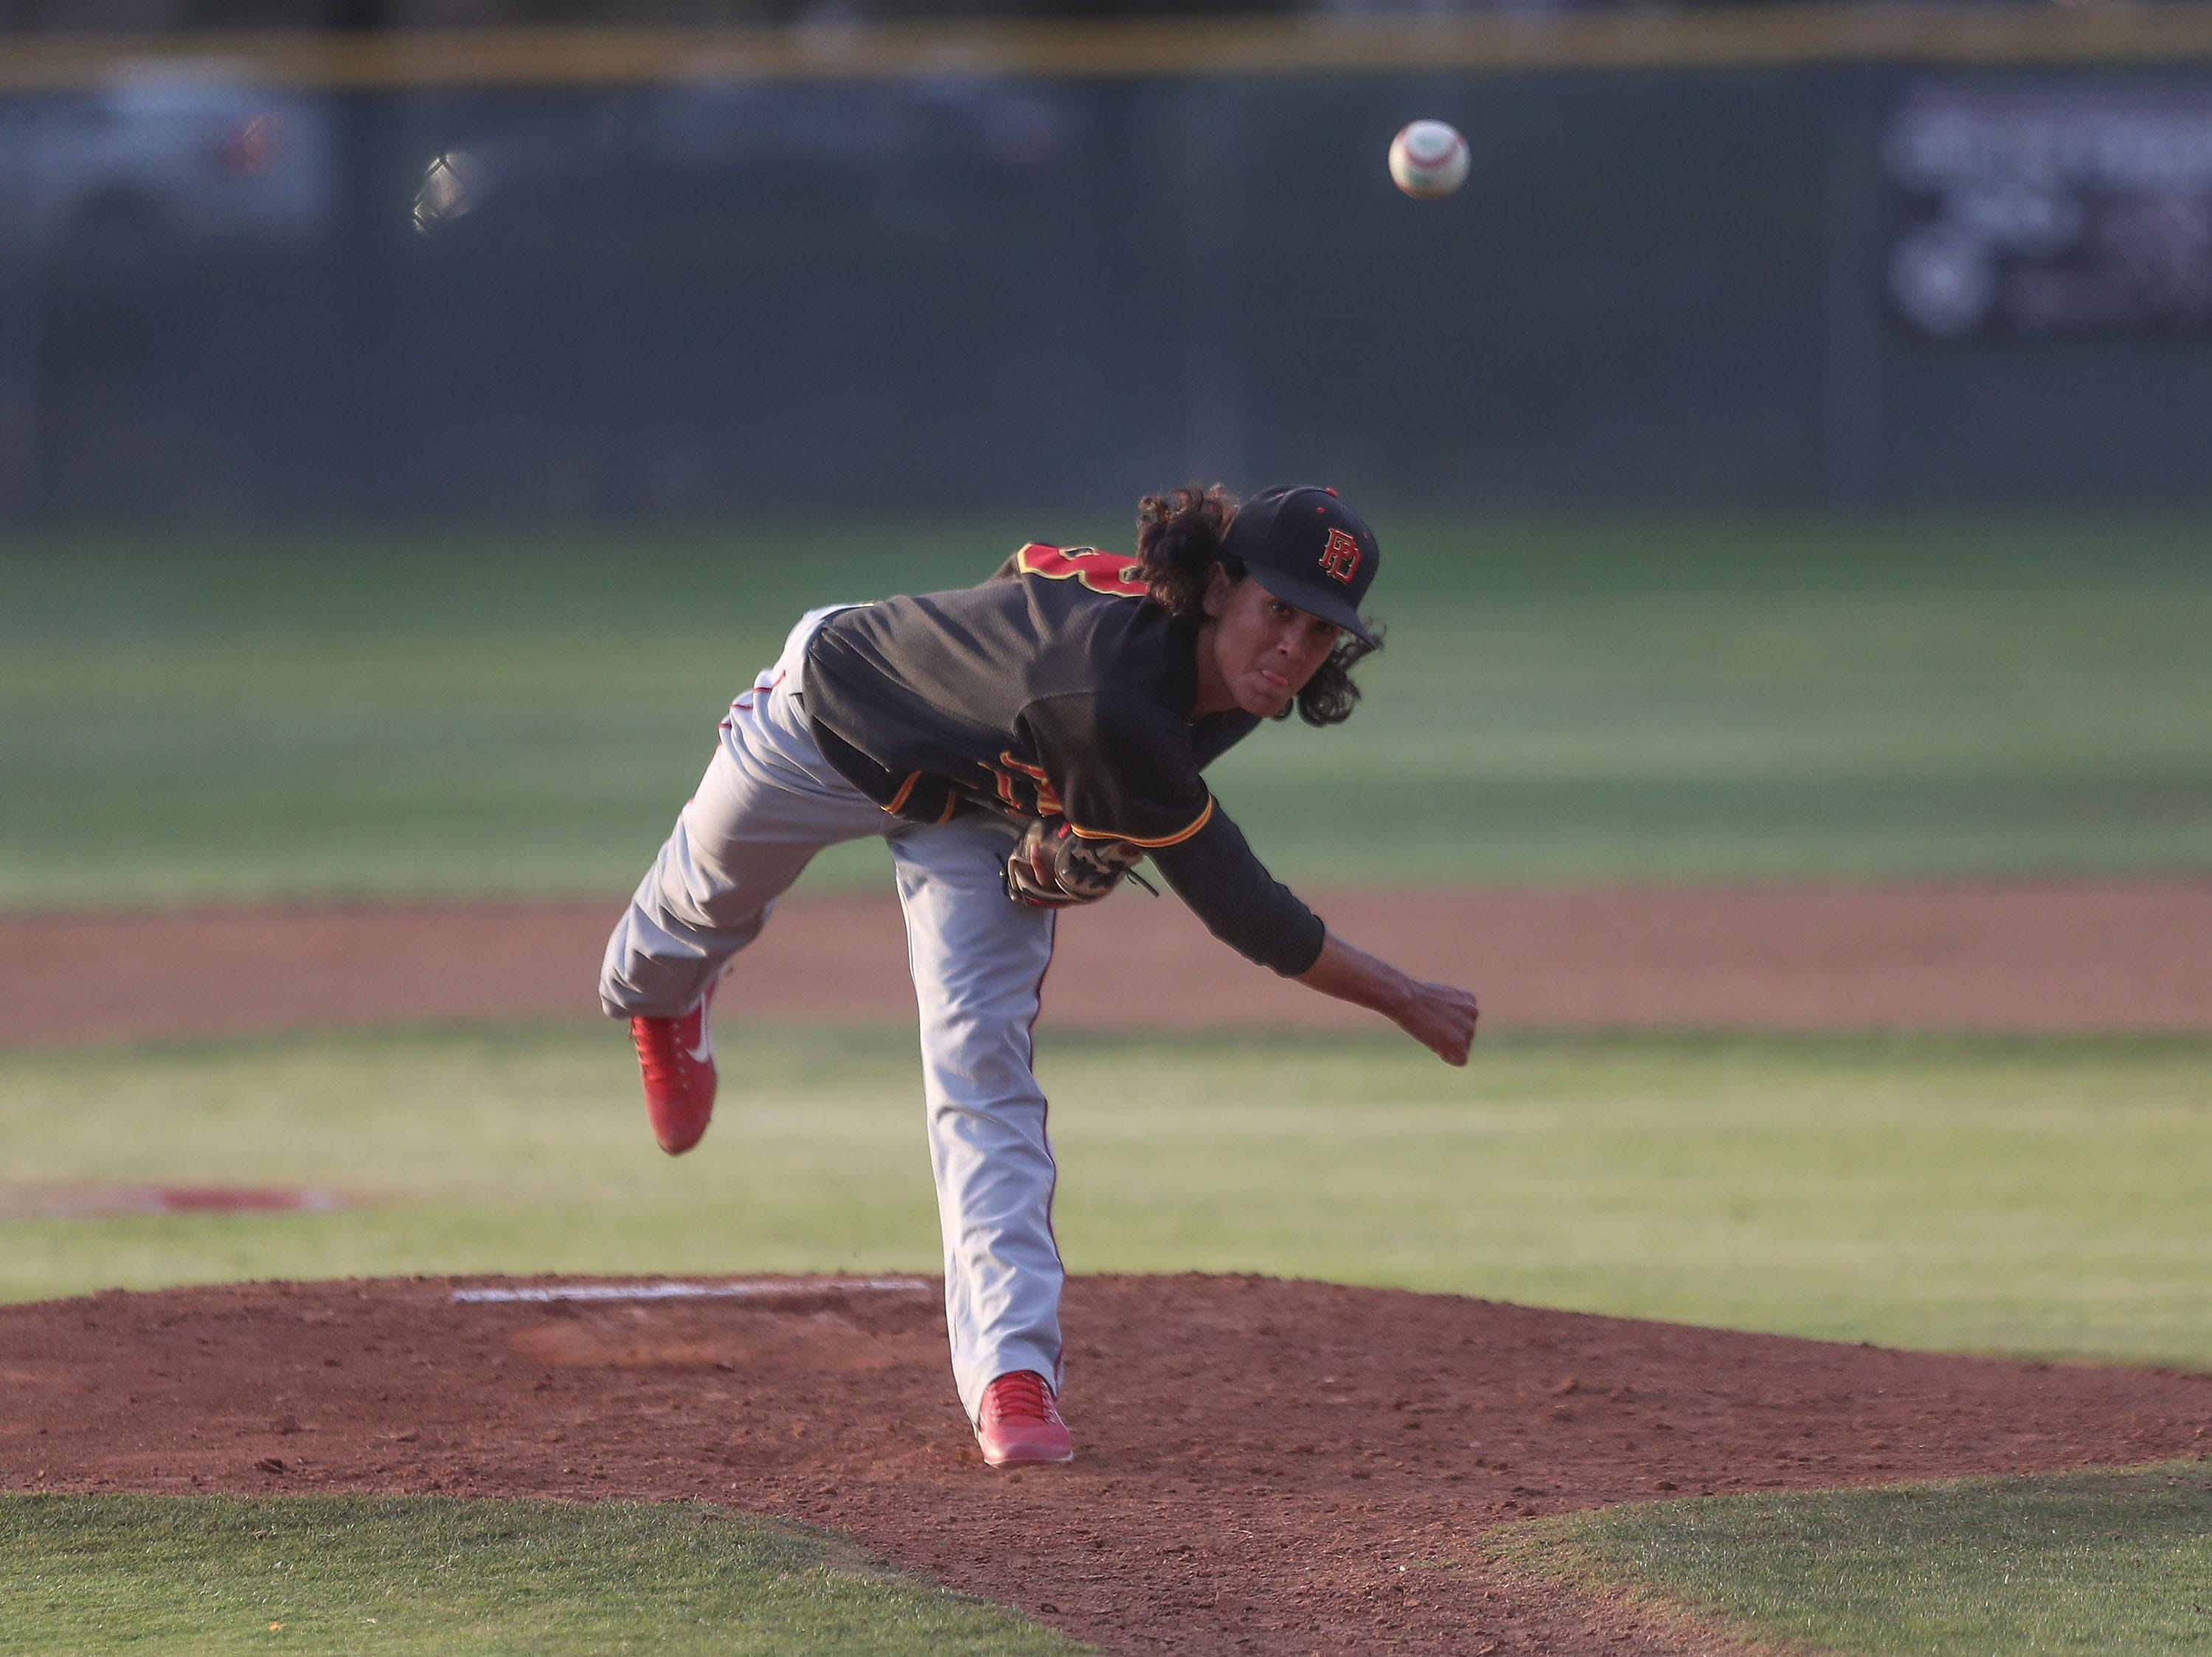 Emiliano Torres of Palm Desert pitches against La Quinta, April 15, 2019.